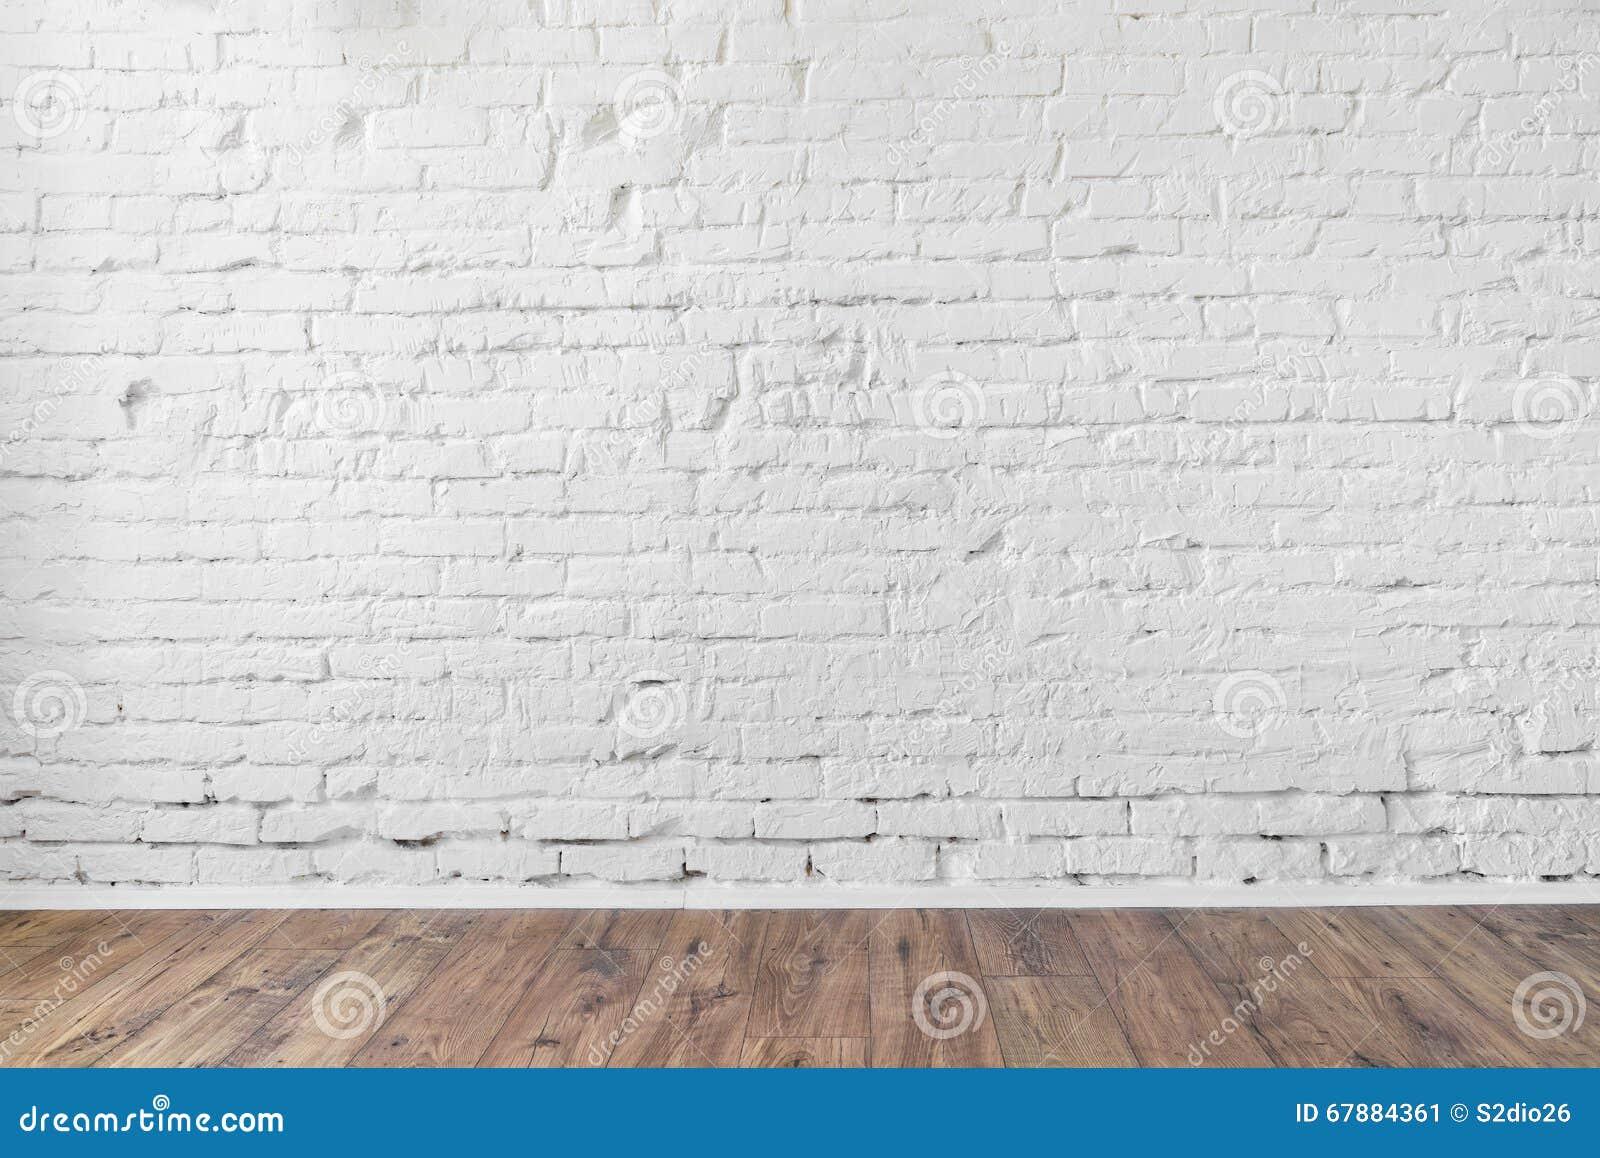 White Brick Wall Background Royalty Free Stock Image